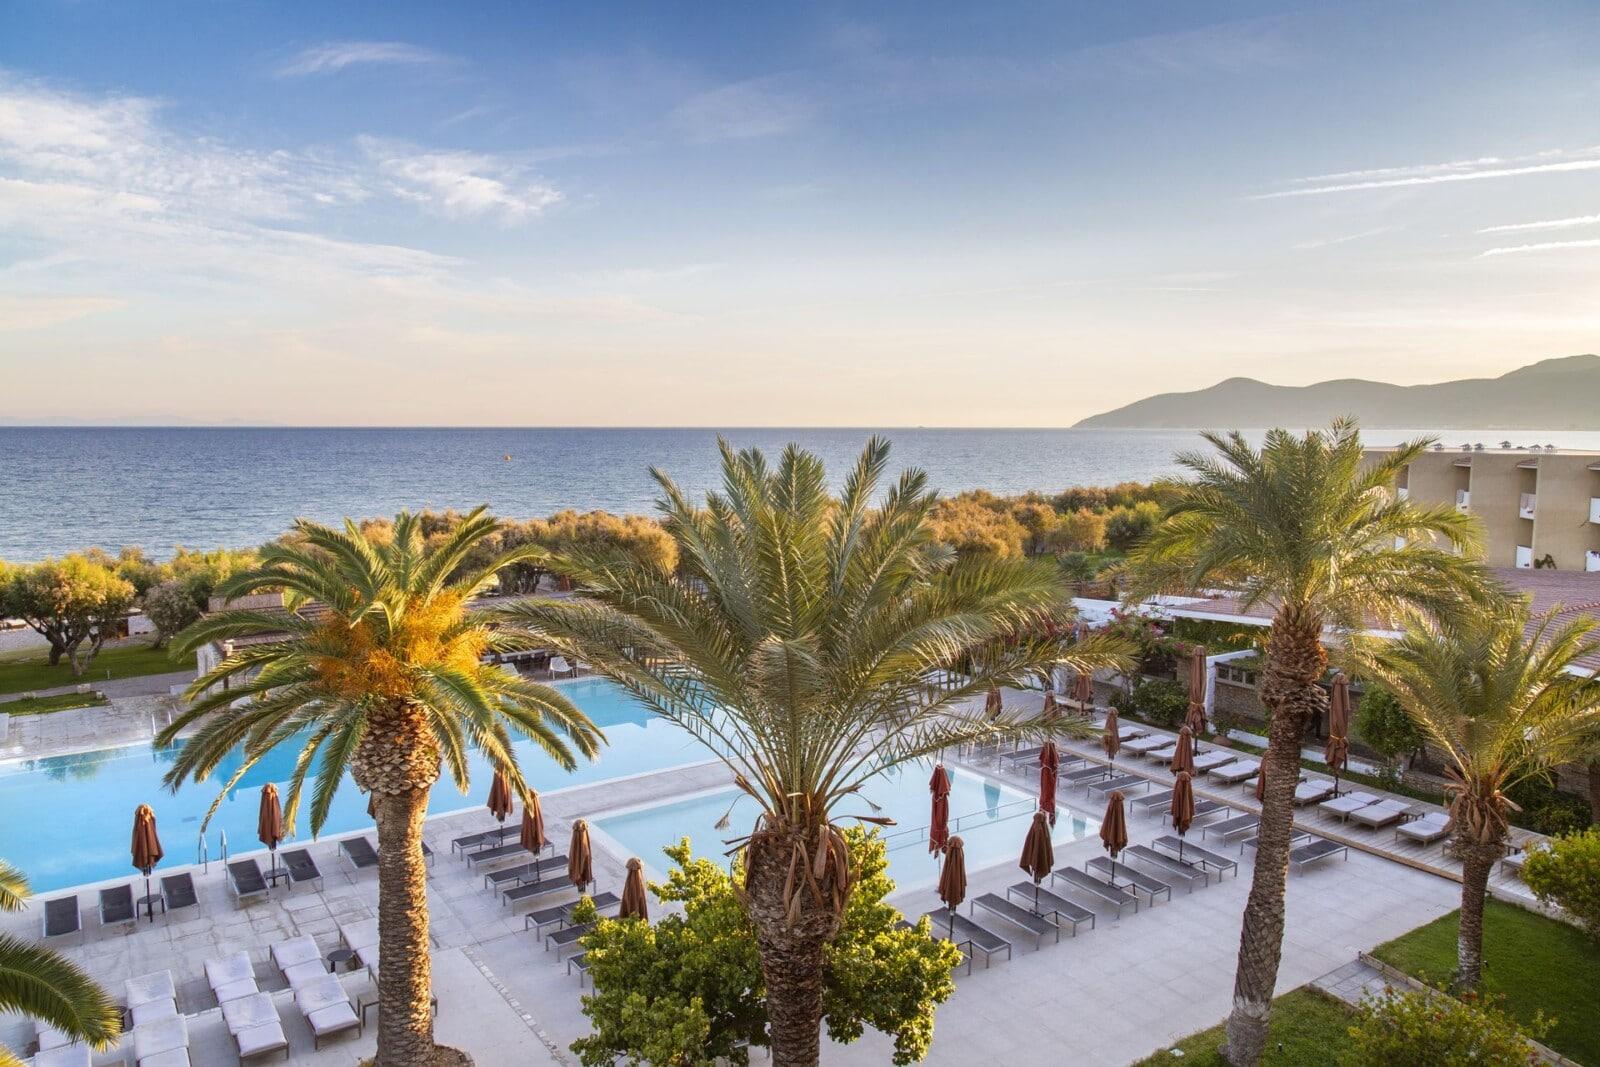 Doryssa luxury hotels in Samos main pools